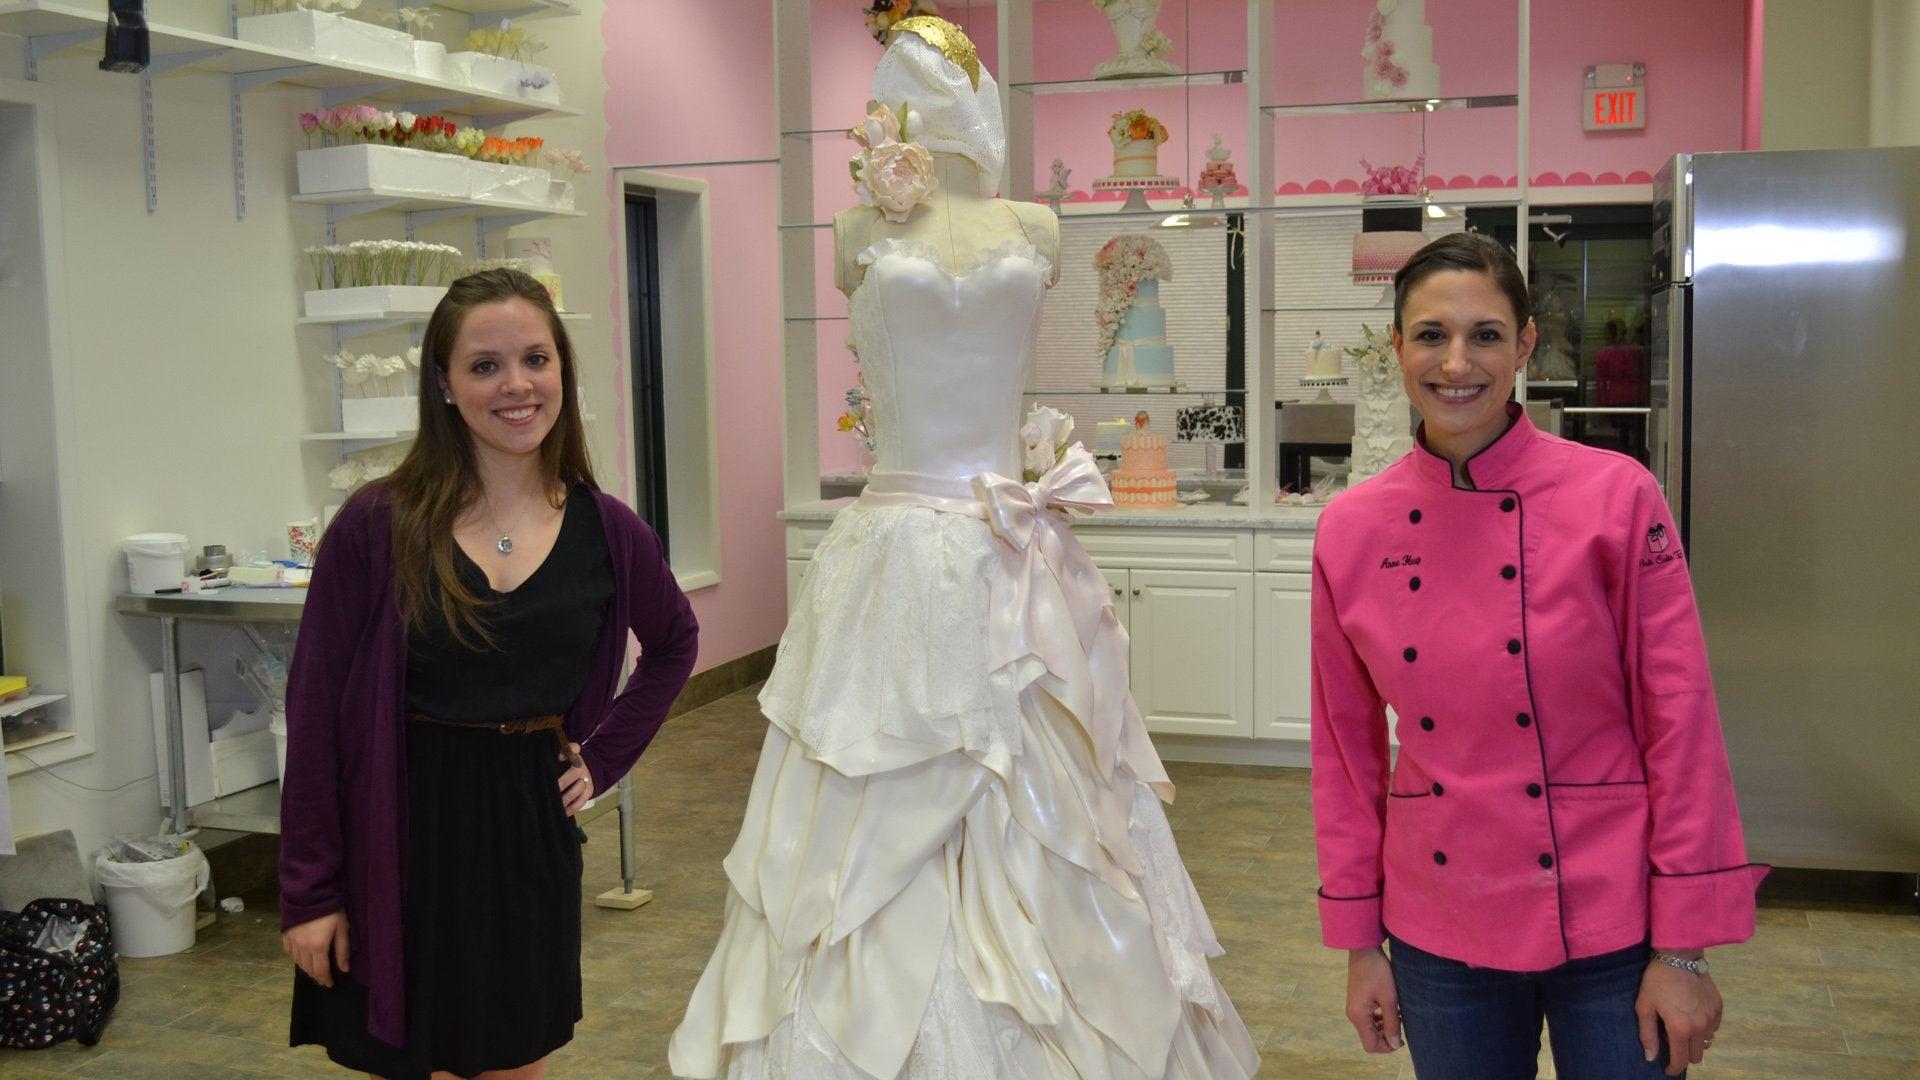 Outrageous Wedding Cakes